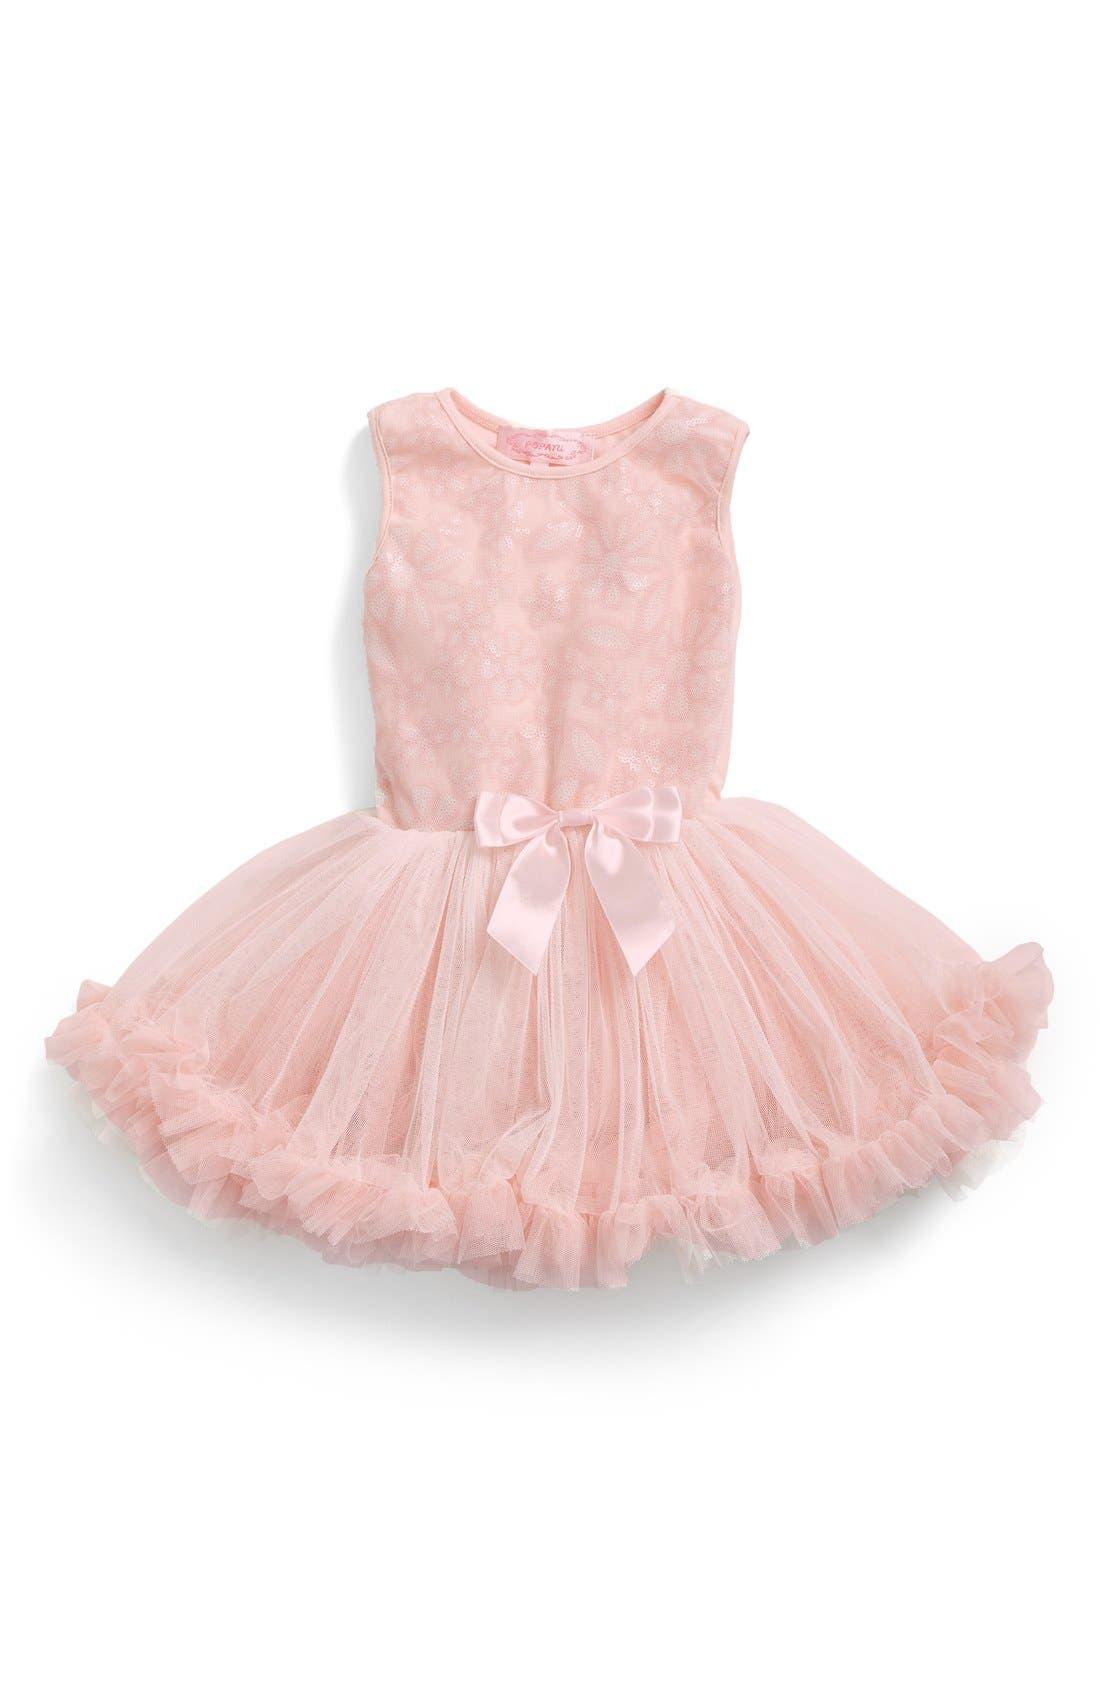 Alternate Image 1 Selected - Popatu Floral Sequin Pettidress (Baby Girls)